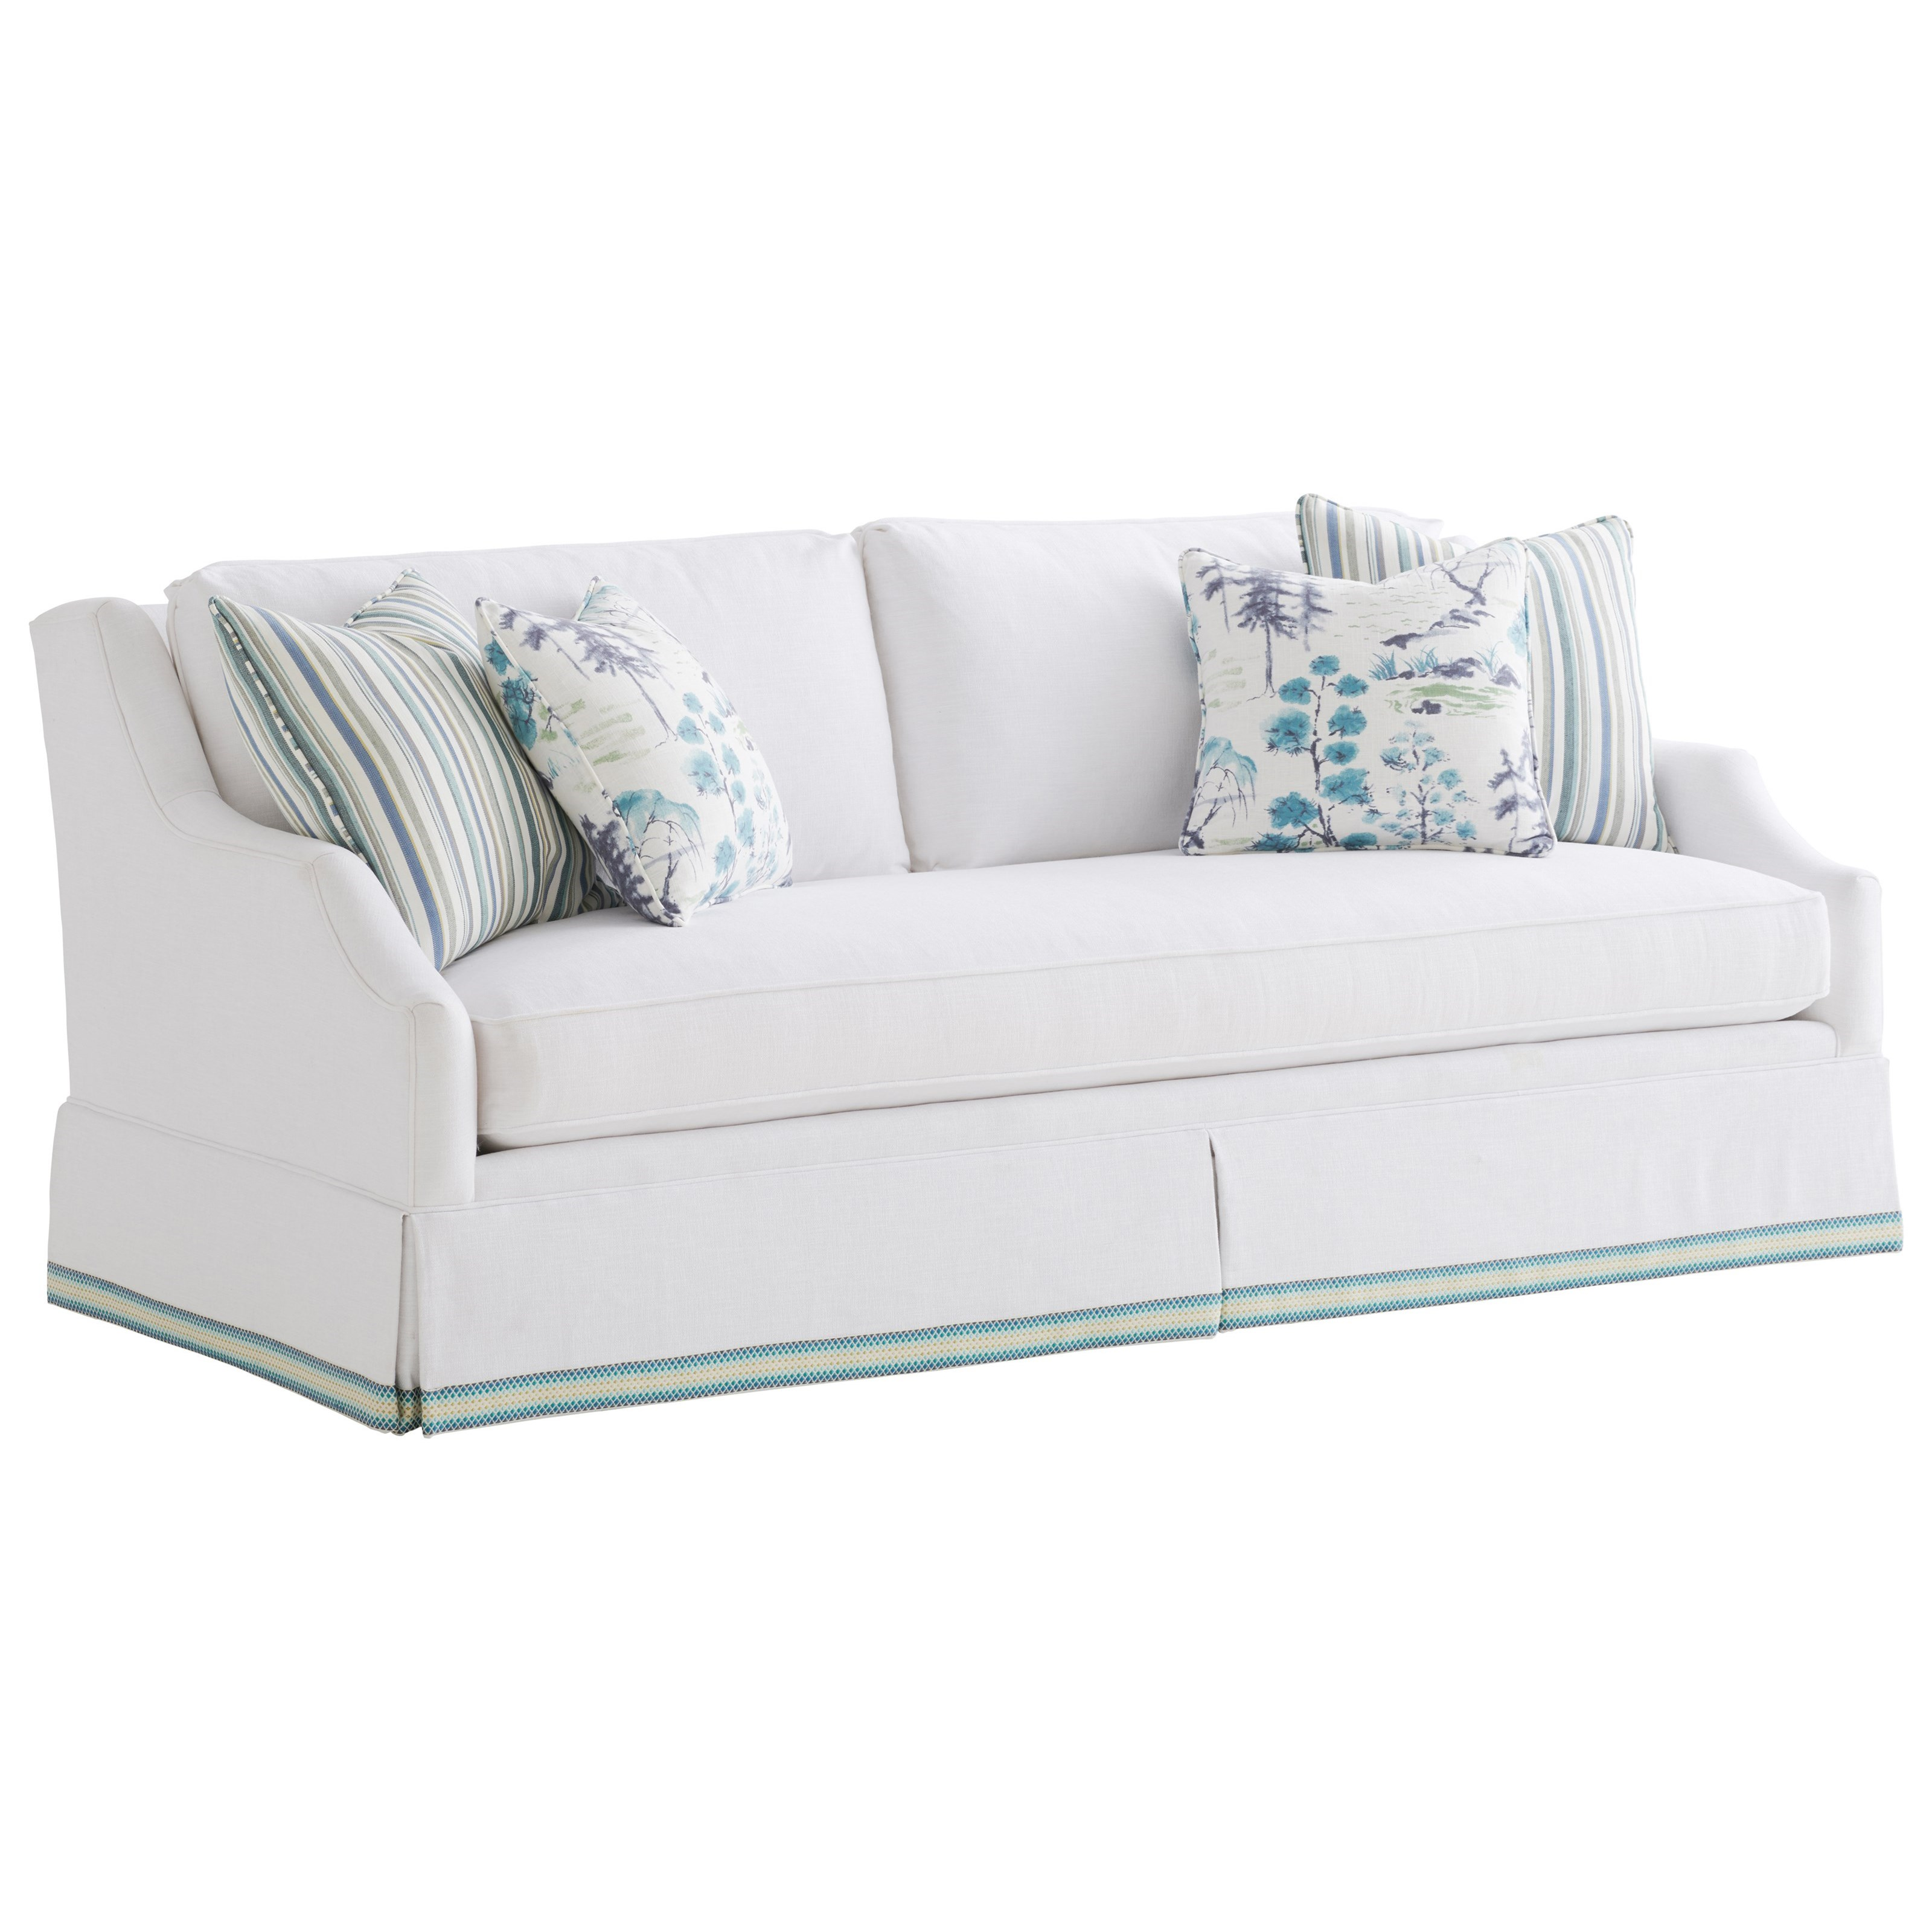 Avondale Hudson Sofa by Lexington at Baer's Furniture